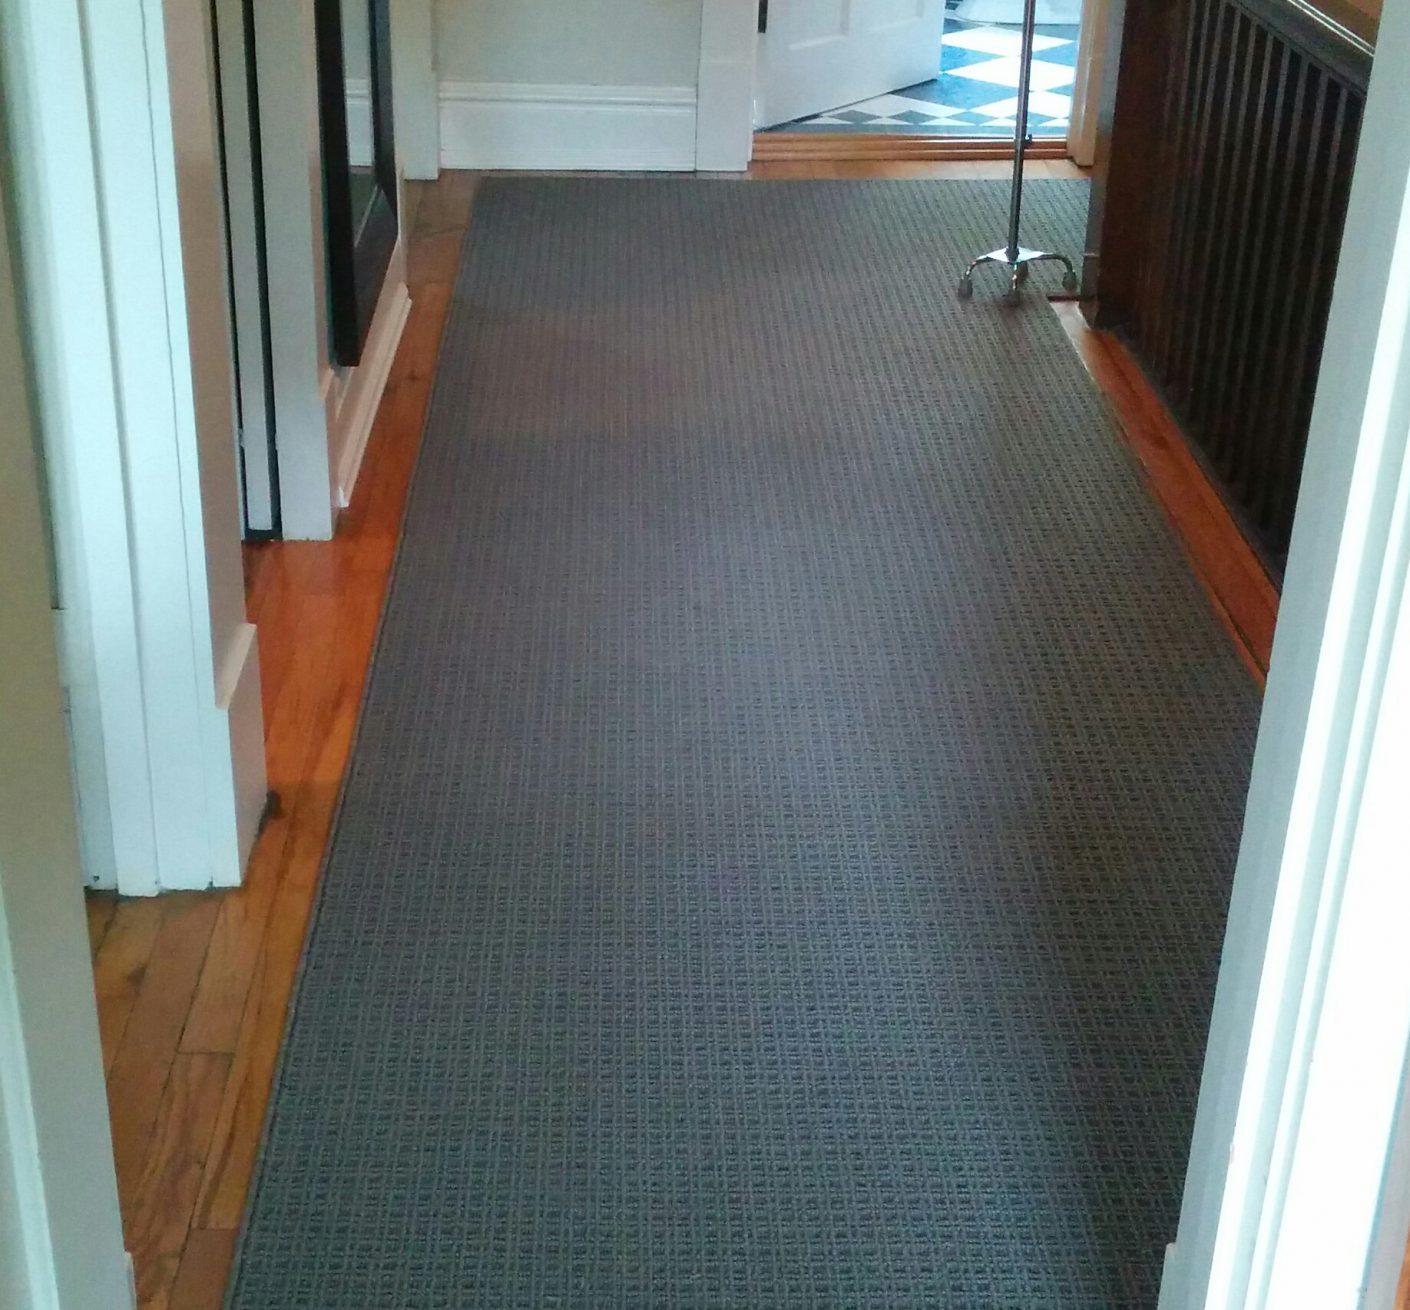 Custom Sized Hallway Carpet Runner, Wool Carpet Runner for hall and Staircase Runners Bradford Ontario Canada